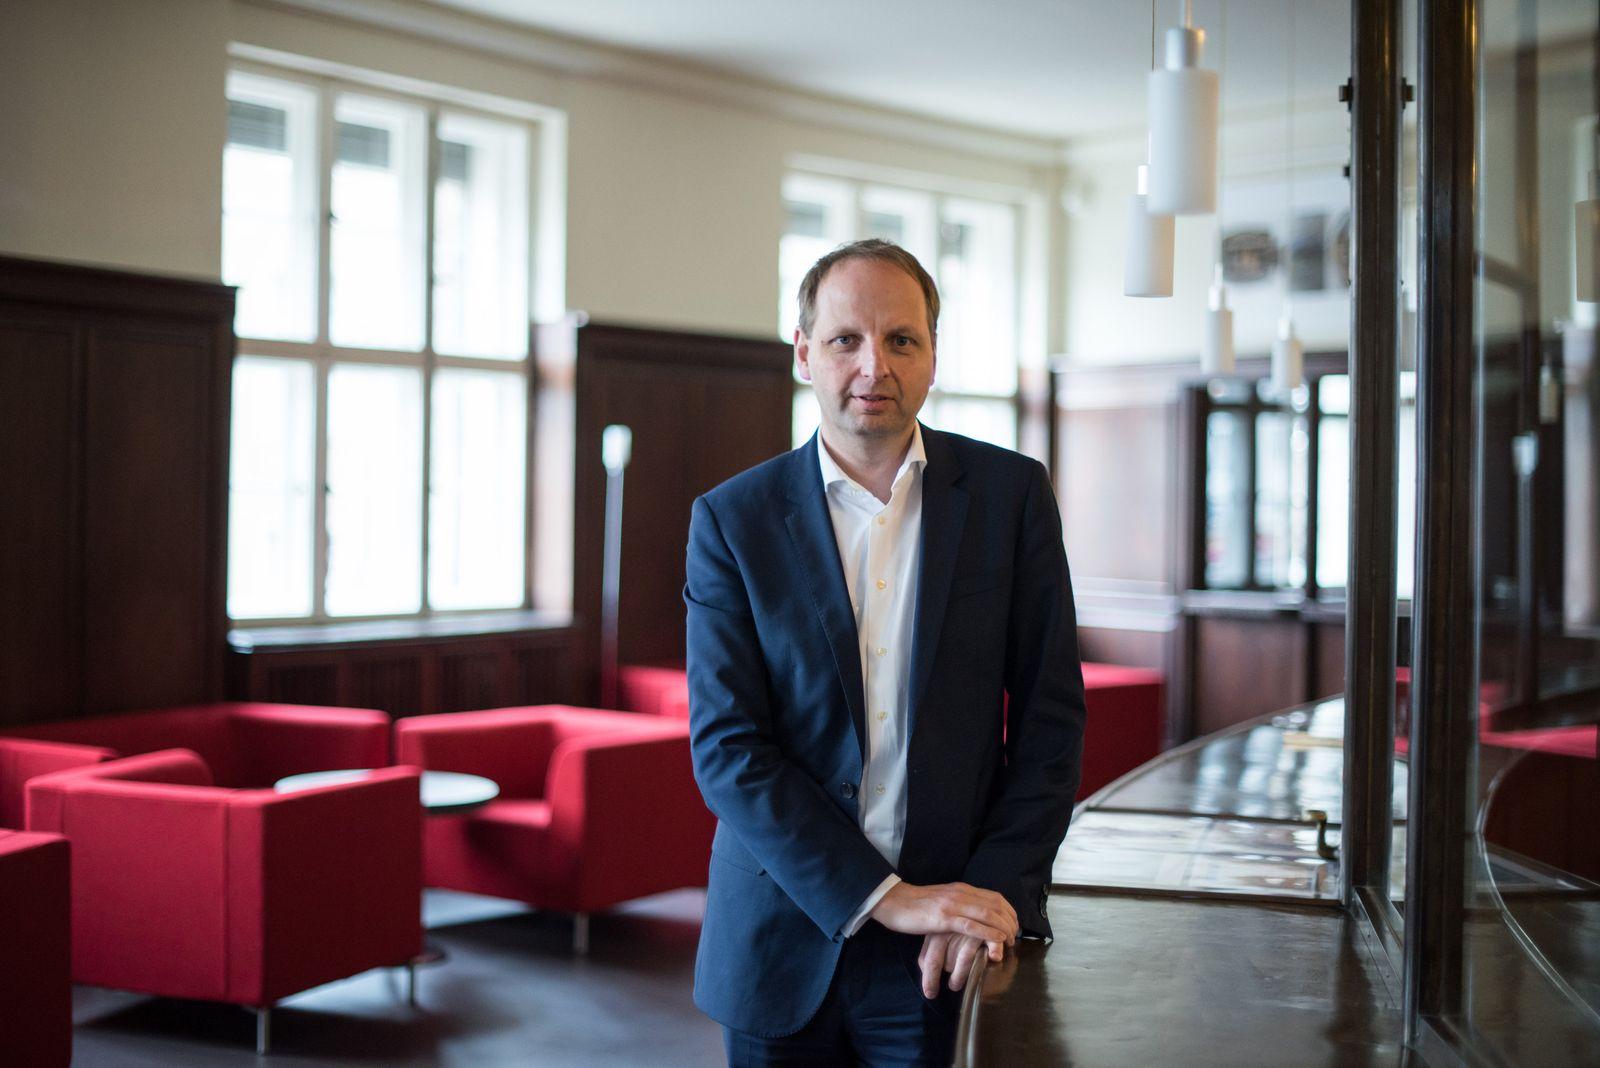 Berliner Justizsenator Thomas Heilmann